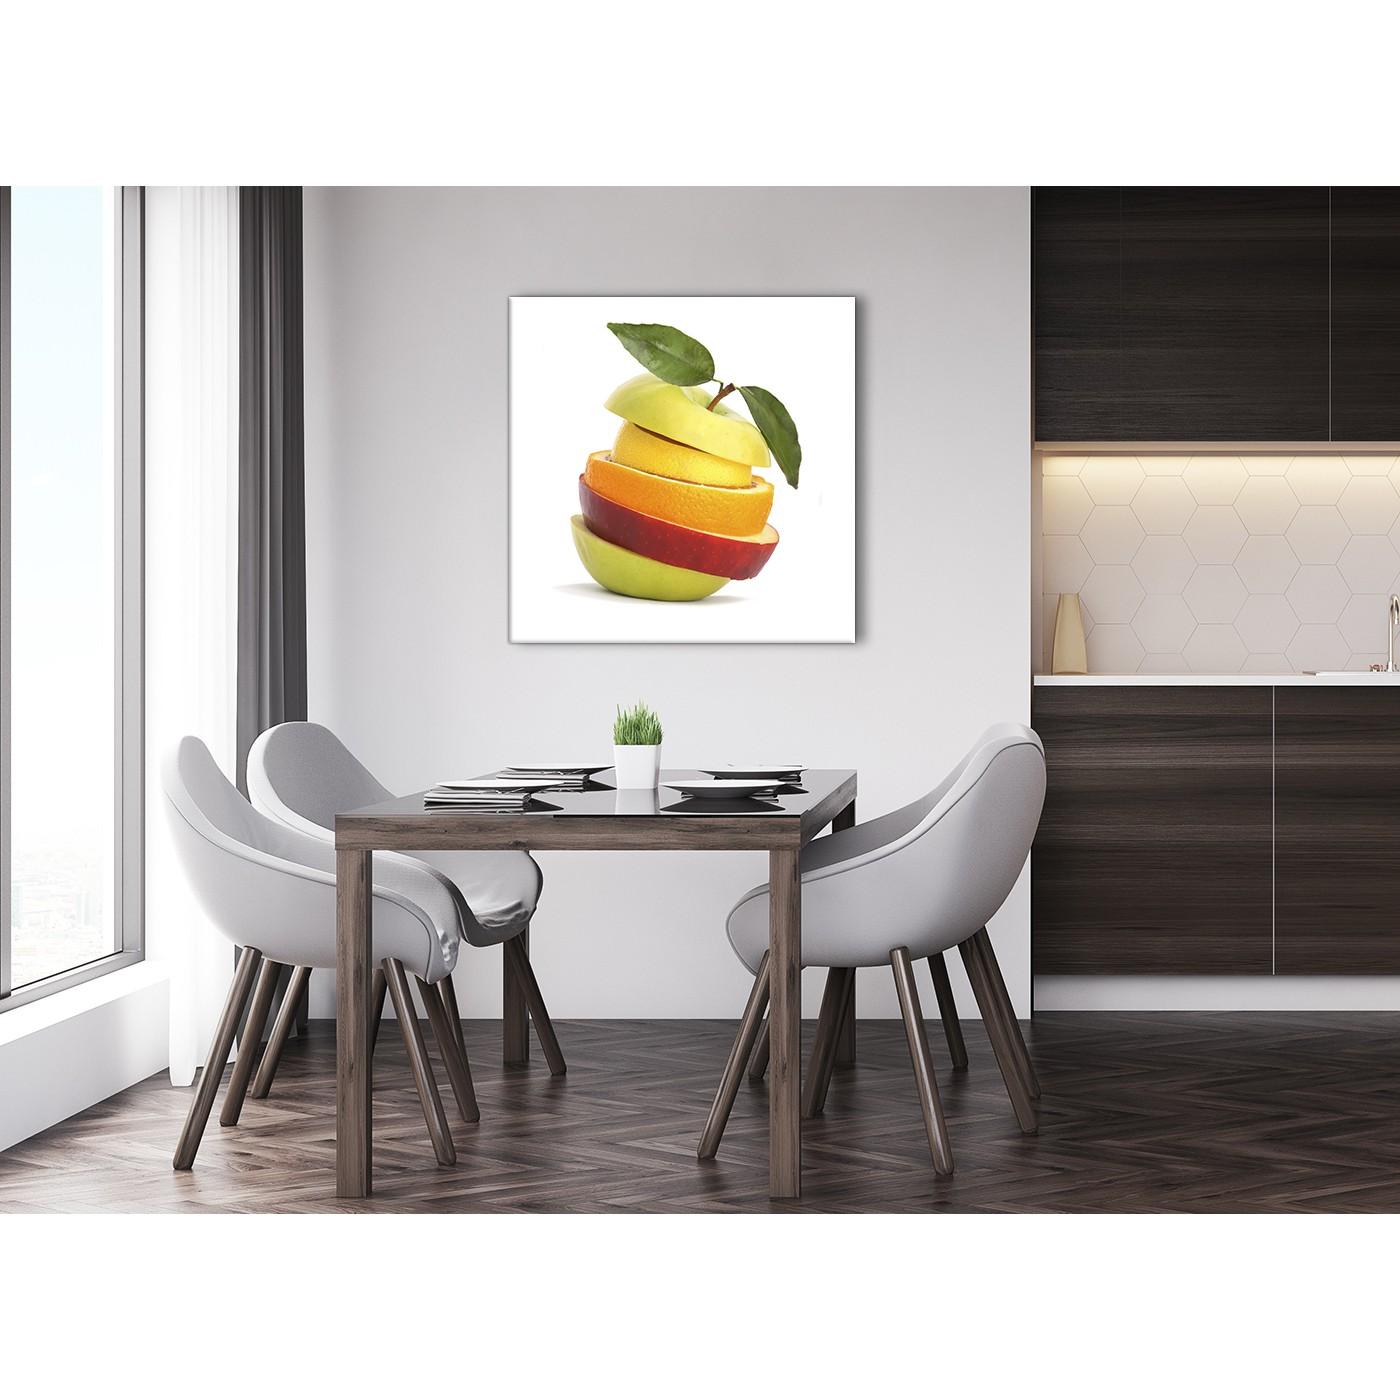 Large Kitchen Canvas Art Print Sliced Fruit